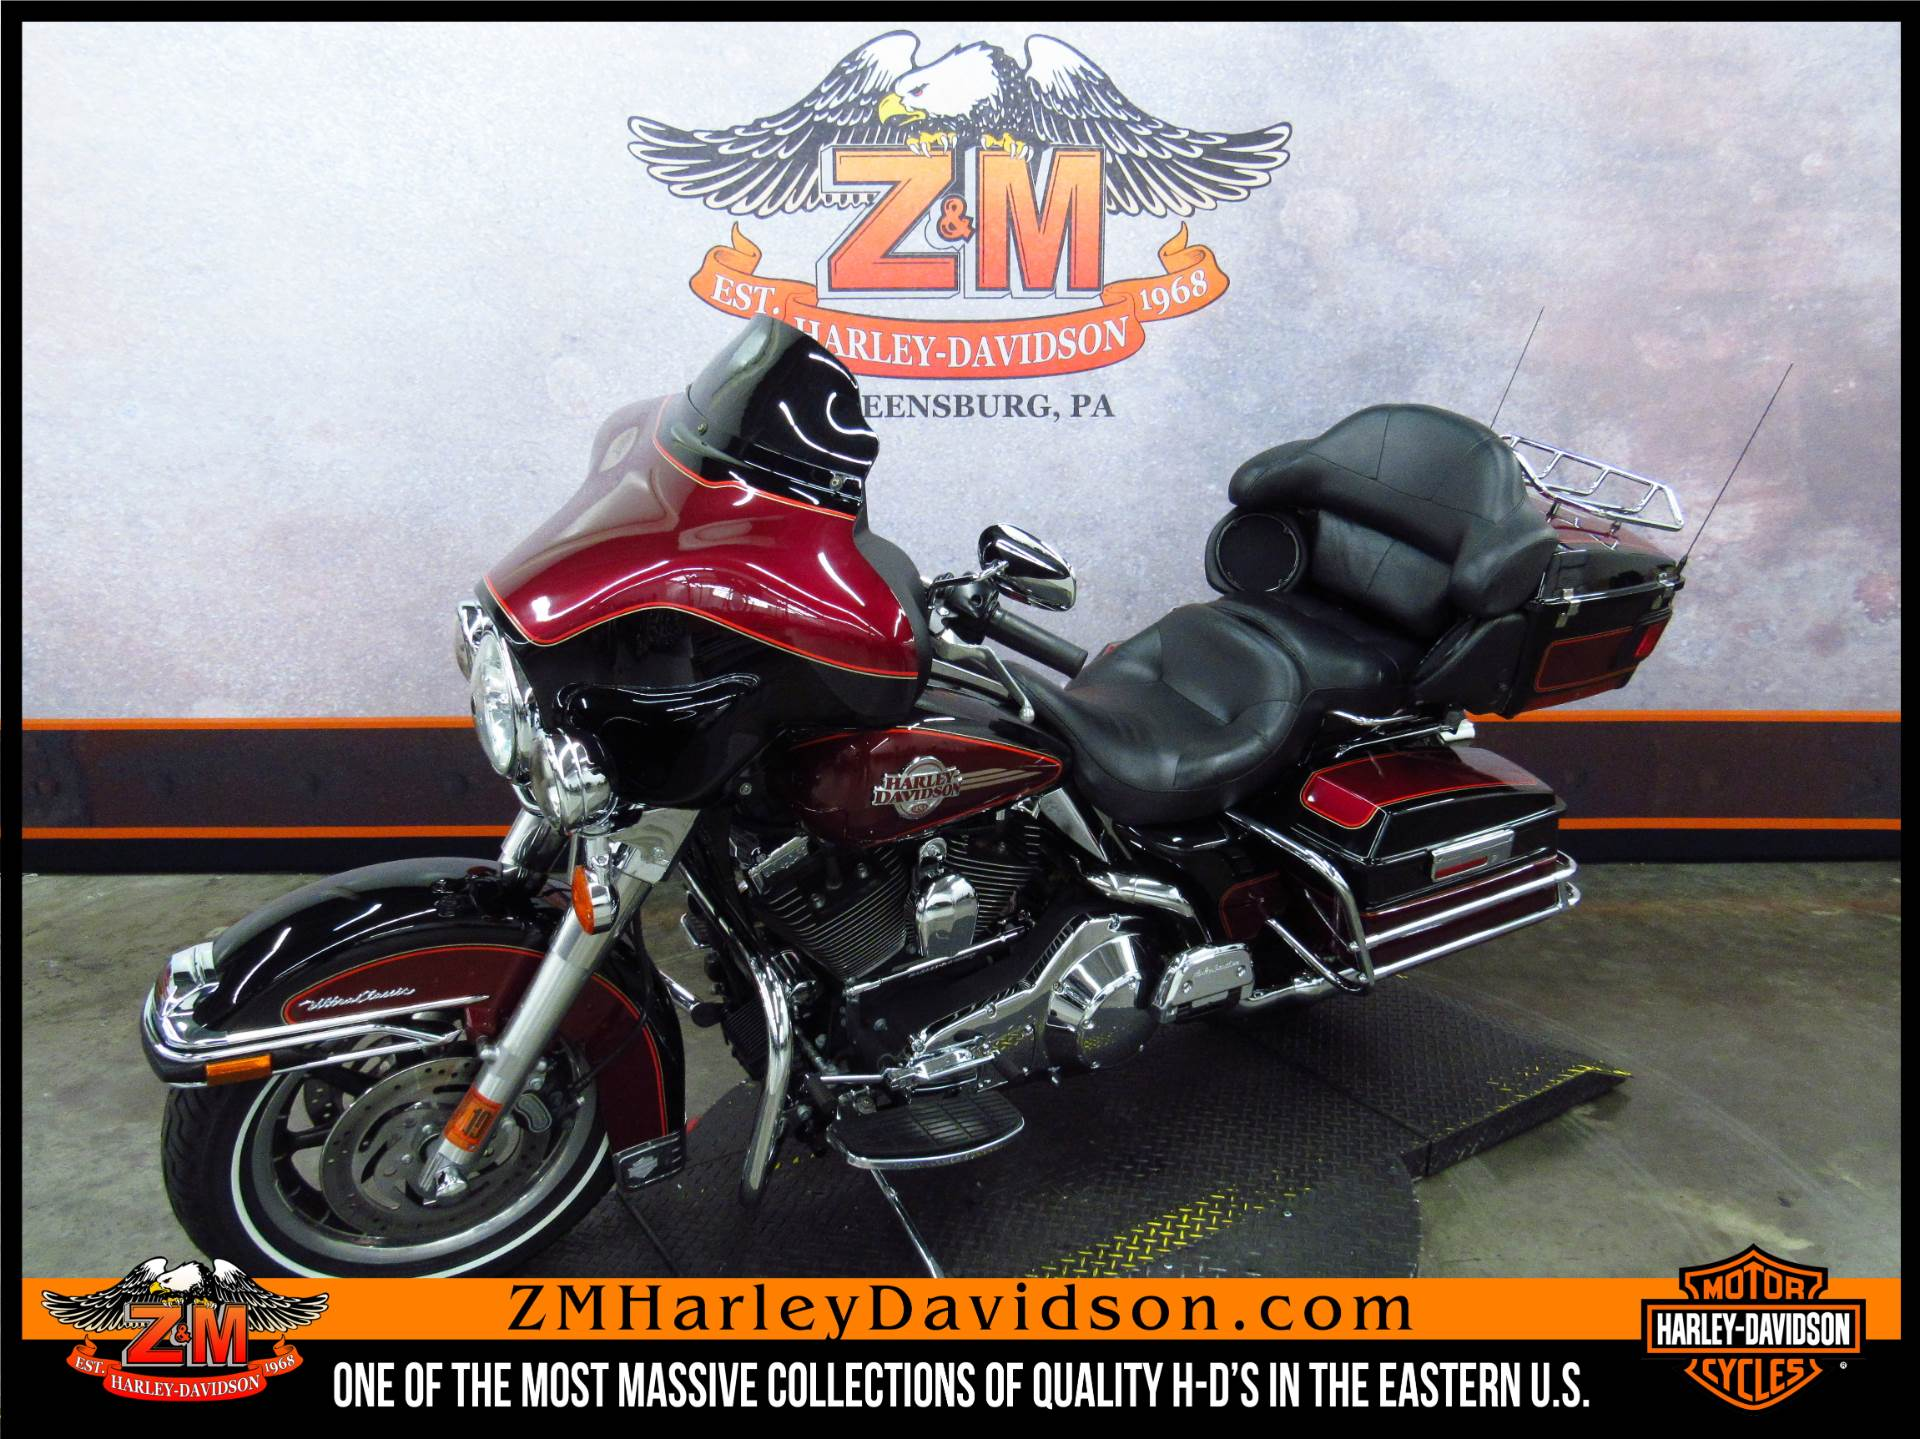 2005 Harley-Davidson FLHTCUI Ultra Classic Electra Glide 5